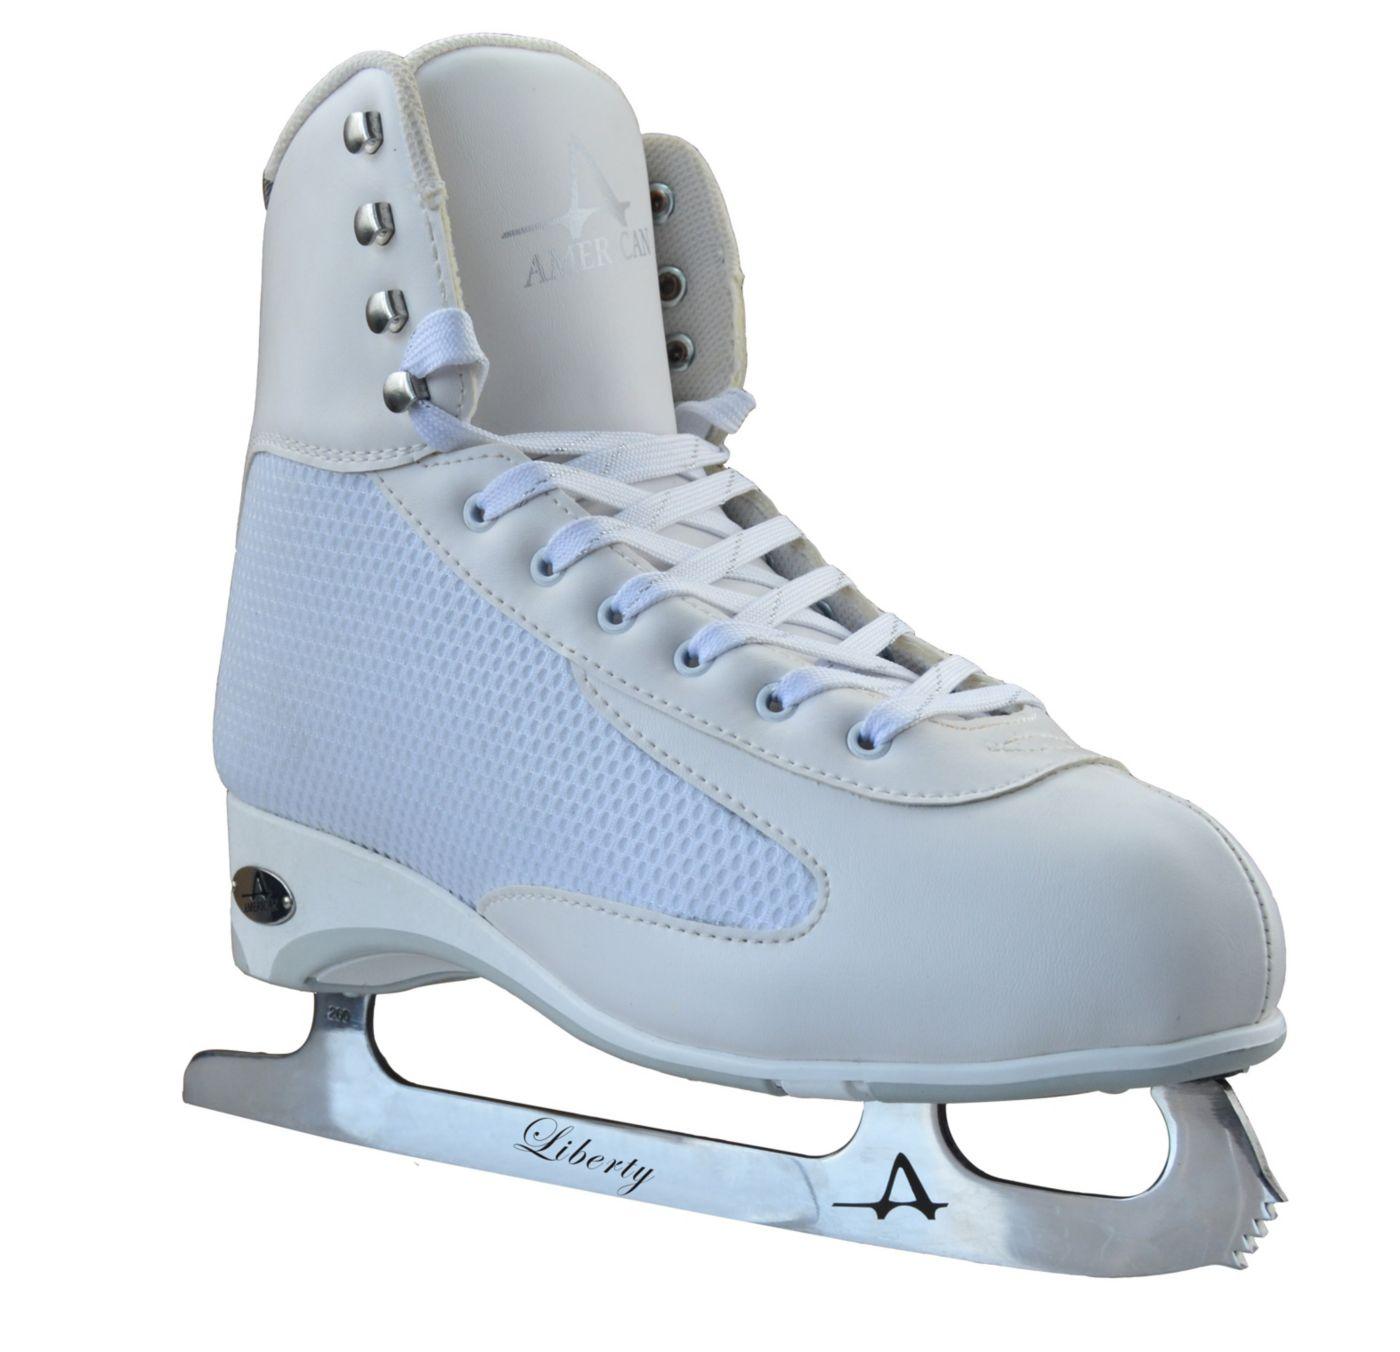 American Athletic Shoe Women's WHITE ICE Figure Skates